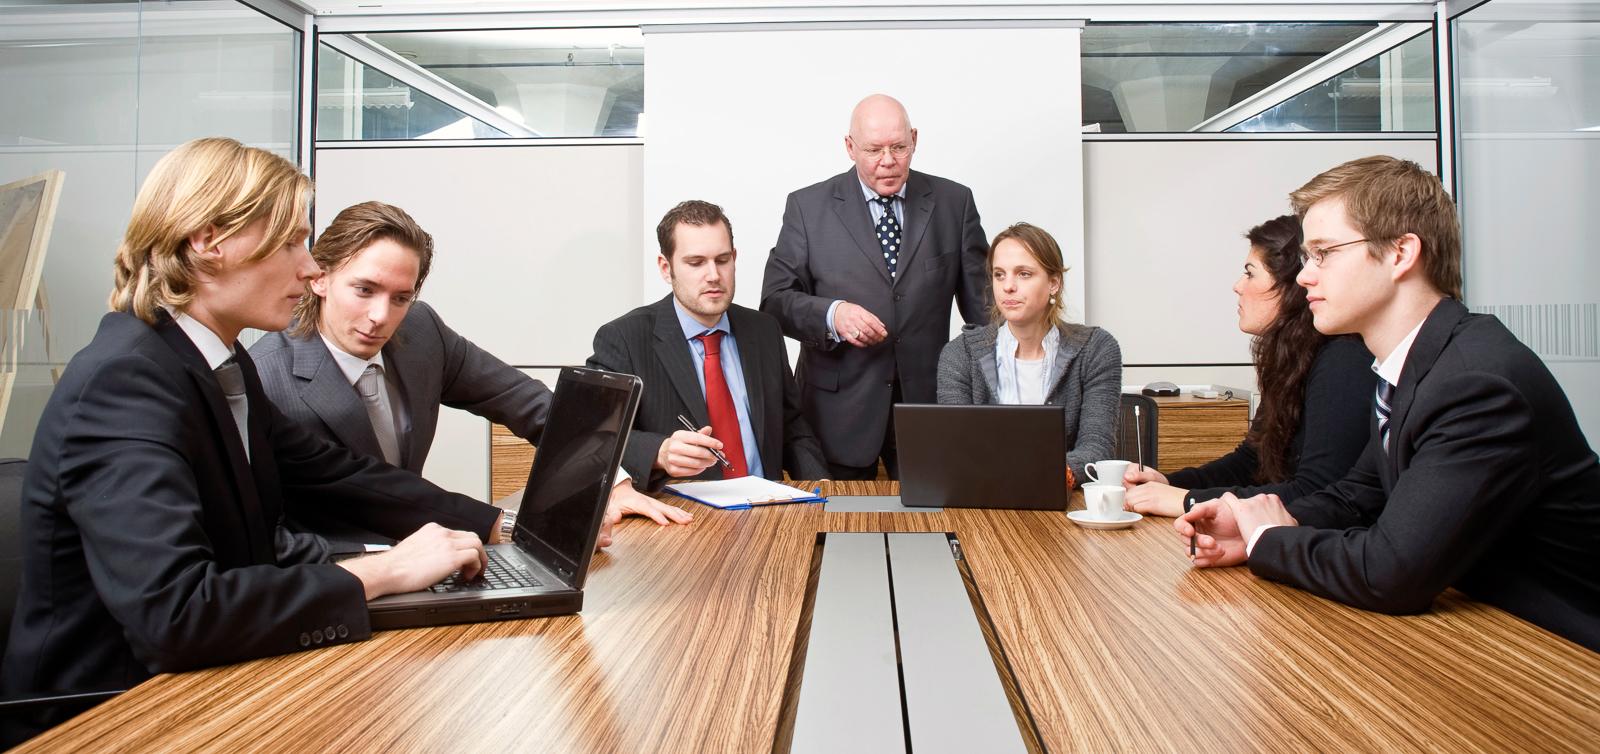 Boardroom meeting   Corepics Stock Production